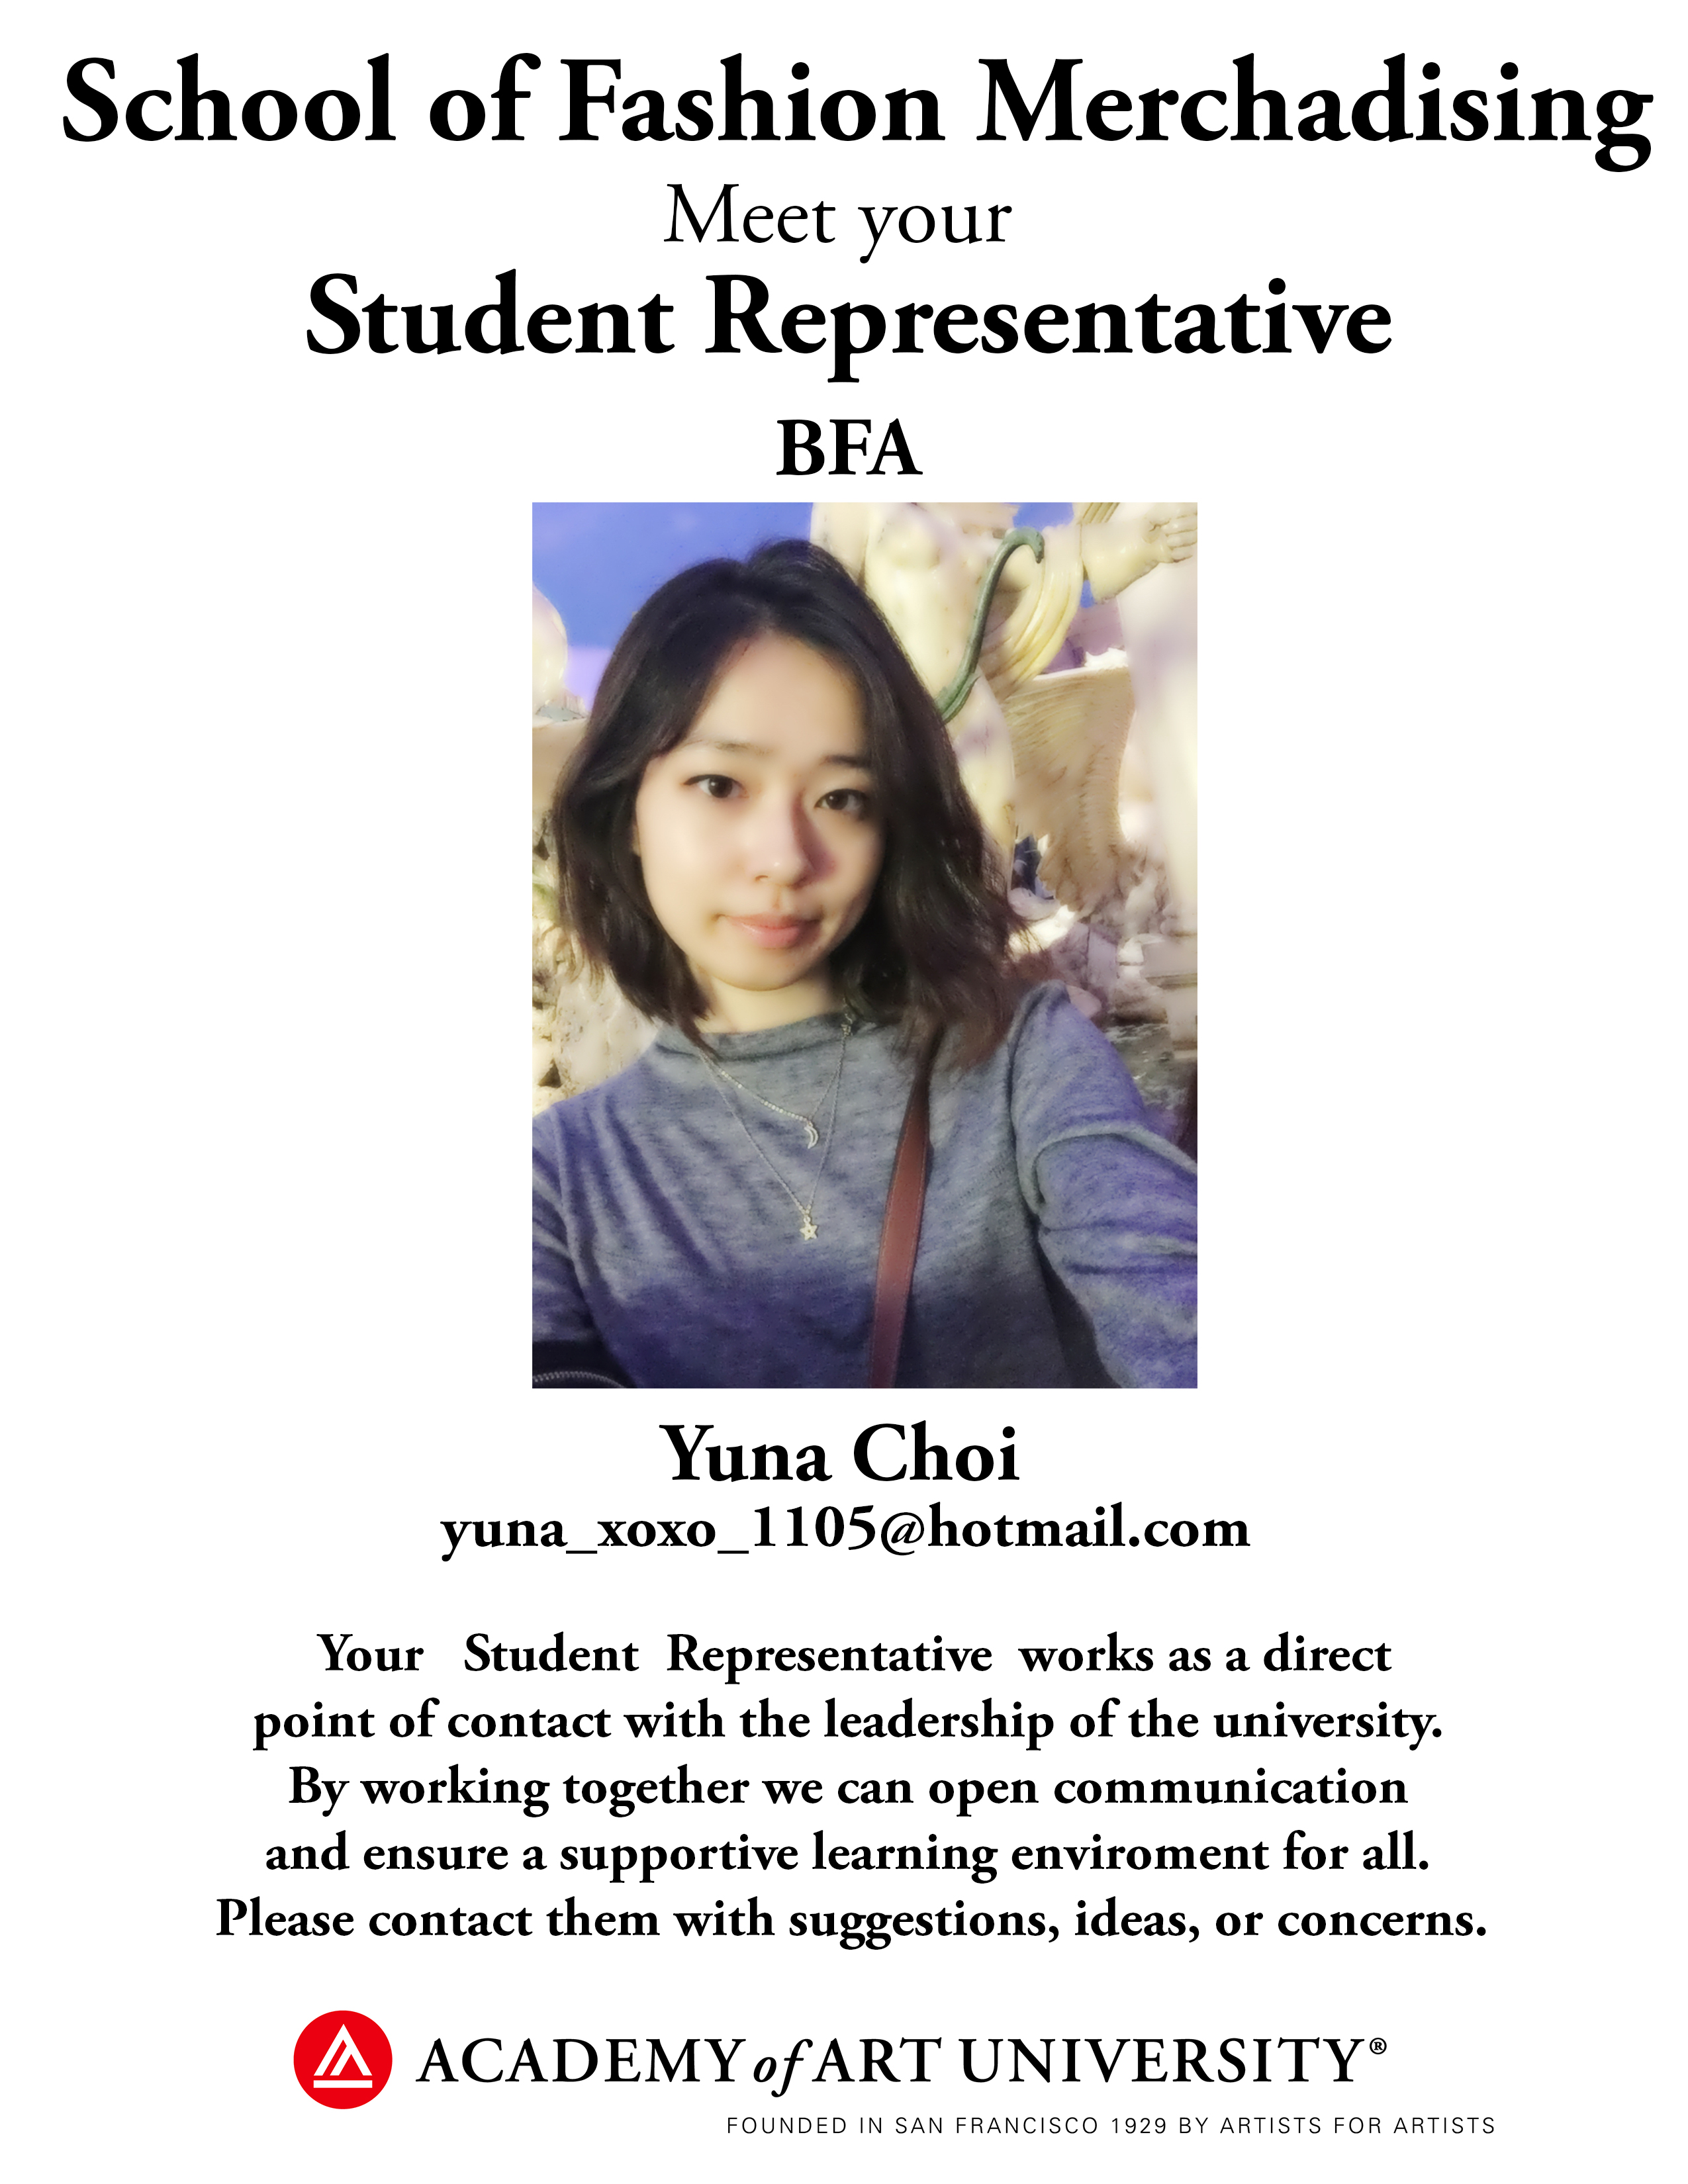 BFA Fashion Merchandising student representative Yuna Choi/email: yuna_xoxo_1105@hotmail.com